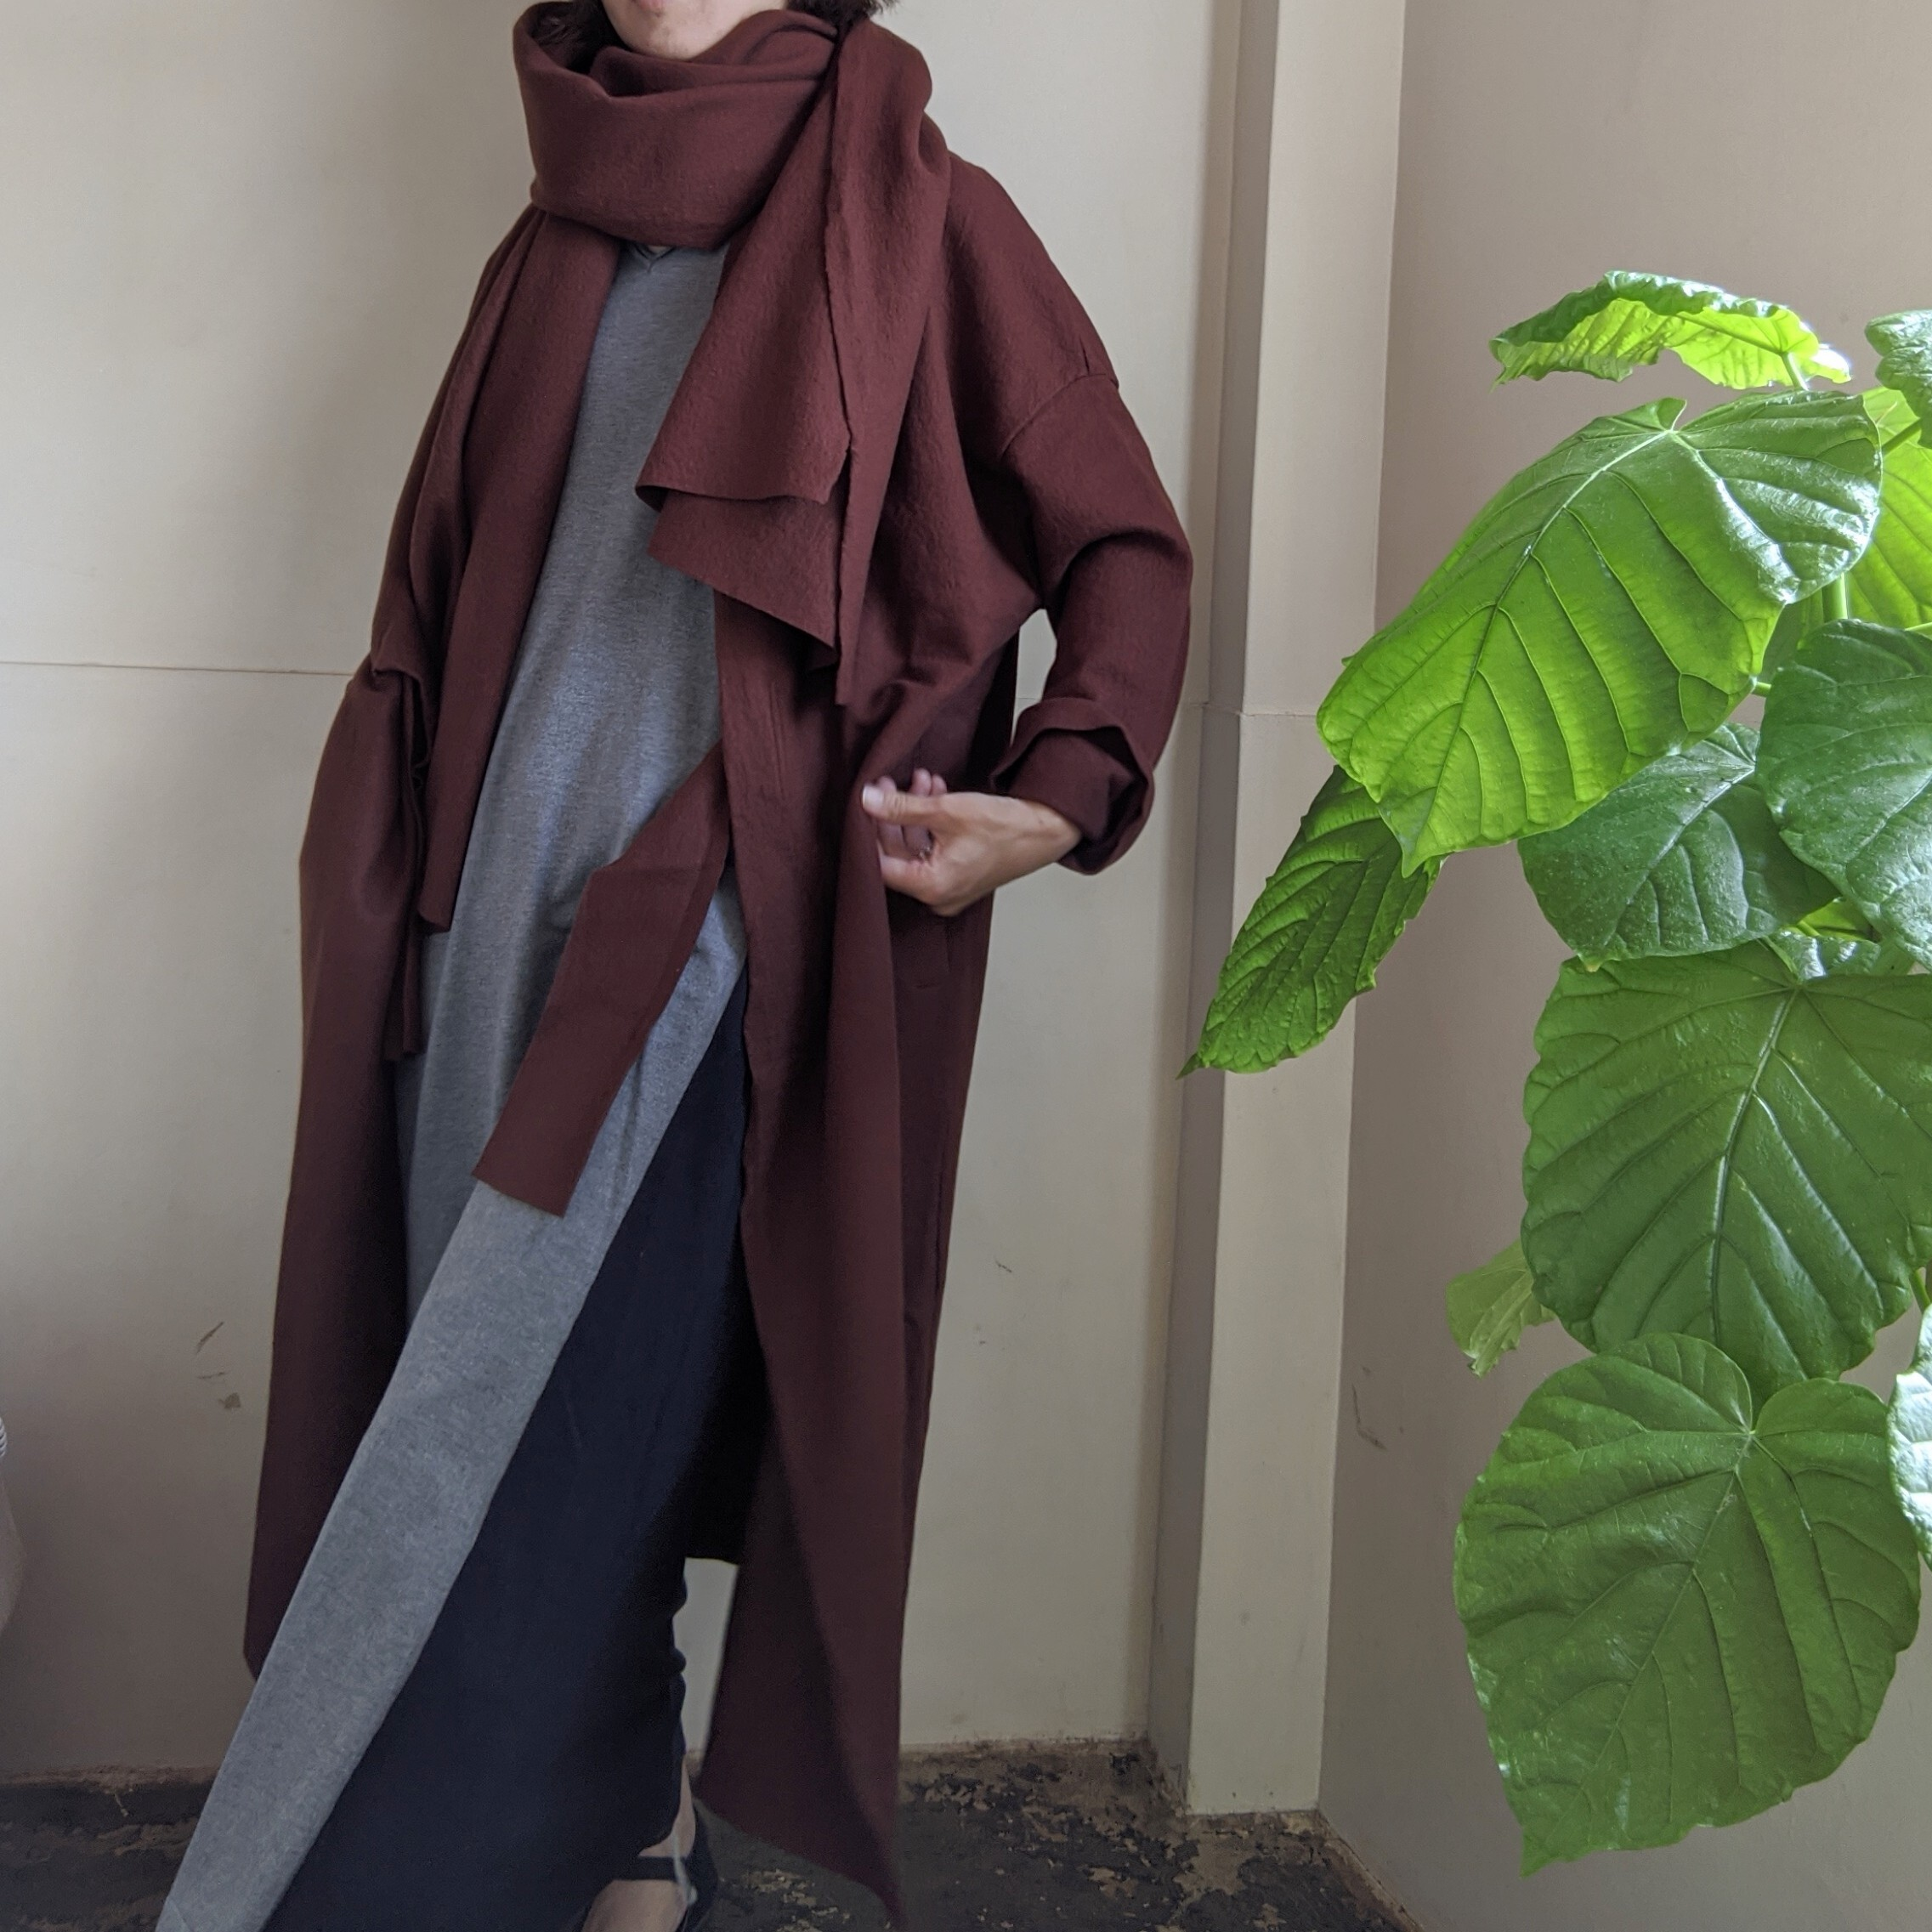 【 habille 】 gown coat / compressed wool / 圧縮ウール / ウールコート / RENGA